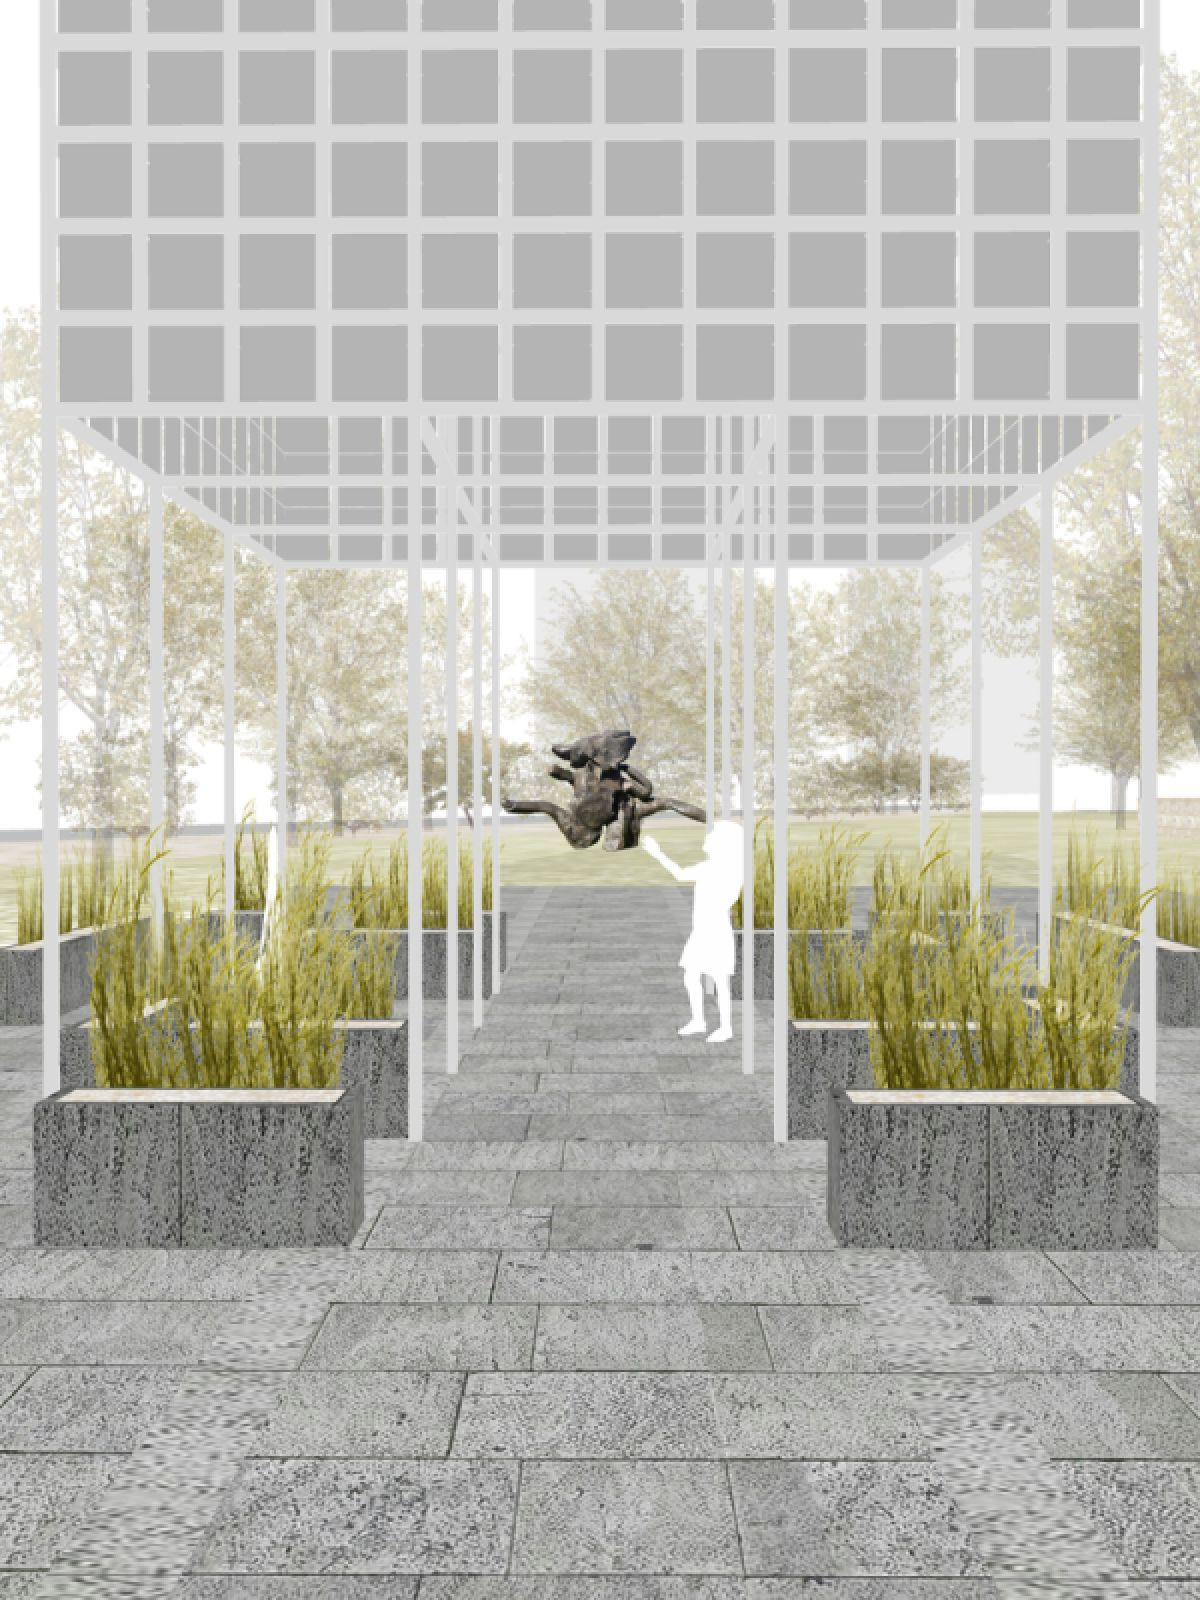 Pavilion of Reflection